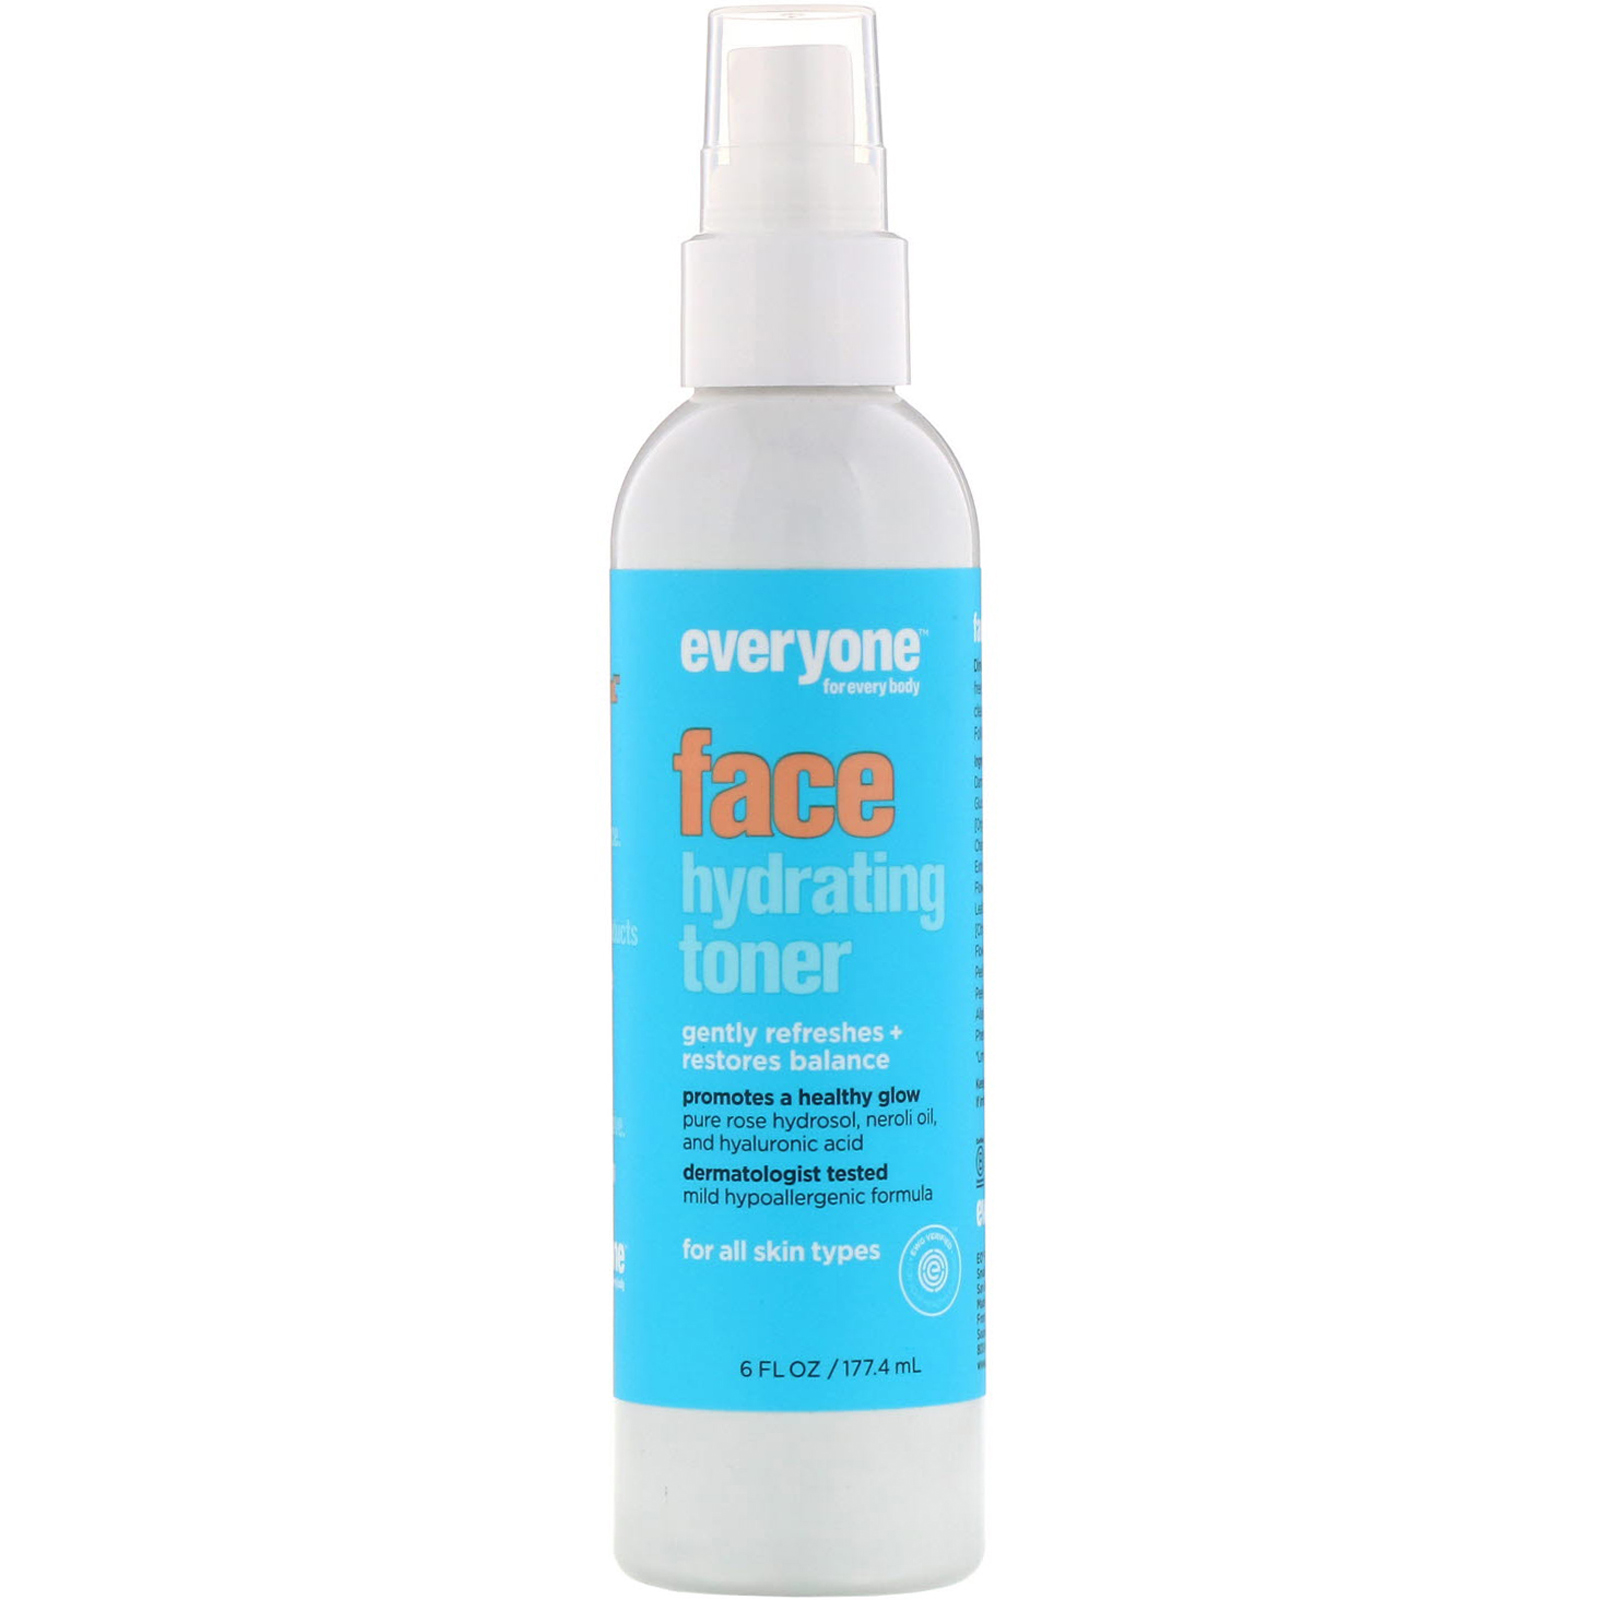 Everyone Face Hydrating Toner 6 fl oz 177 4 ml | eBay